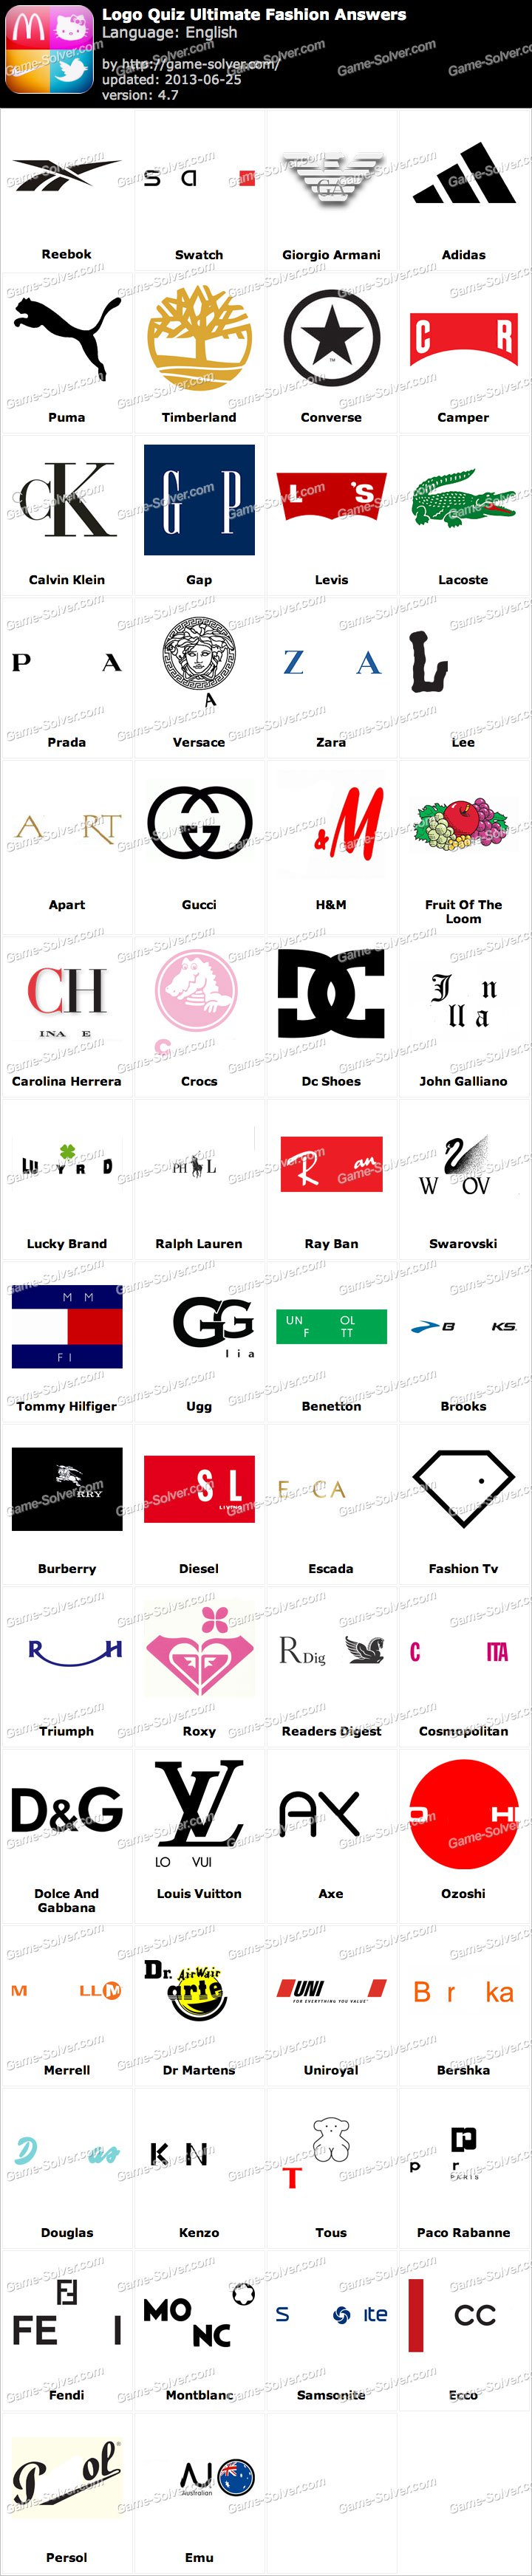 Italian Shoes Brands Logos